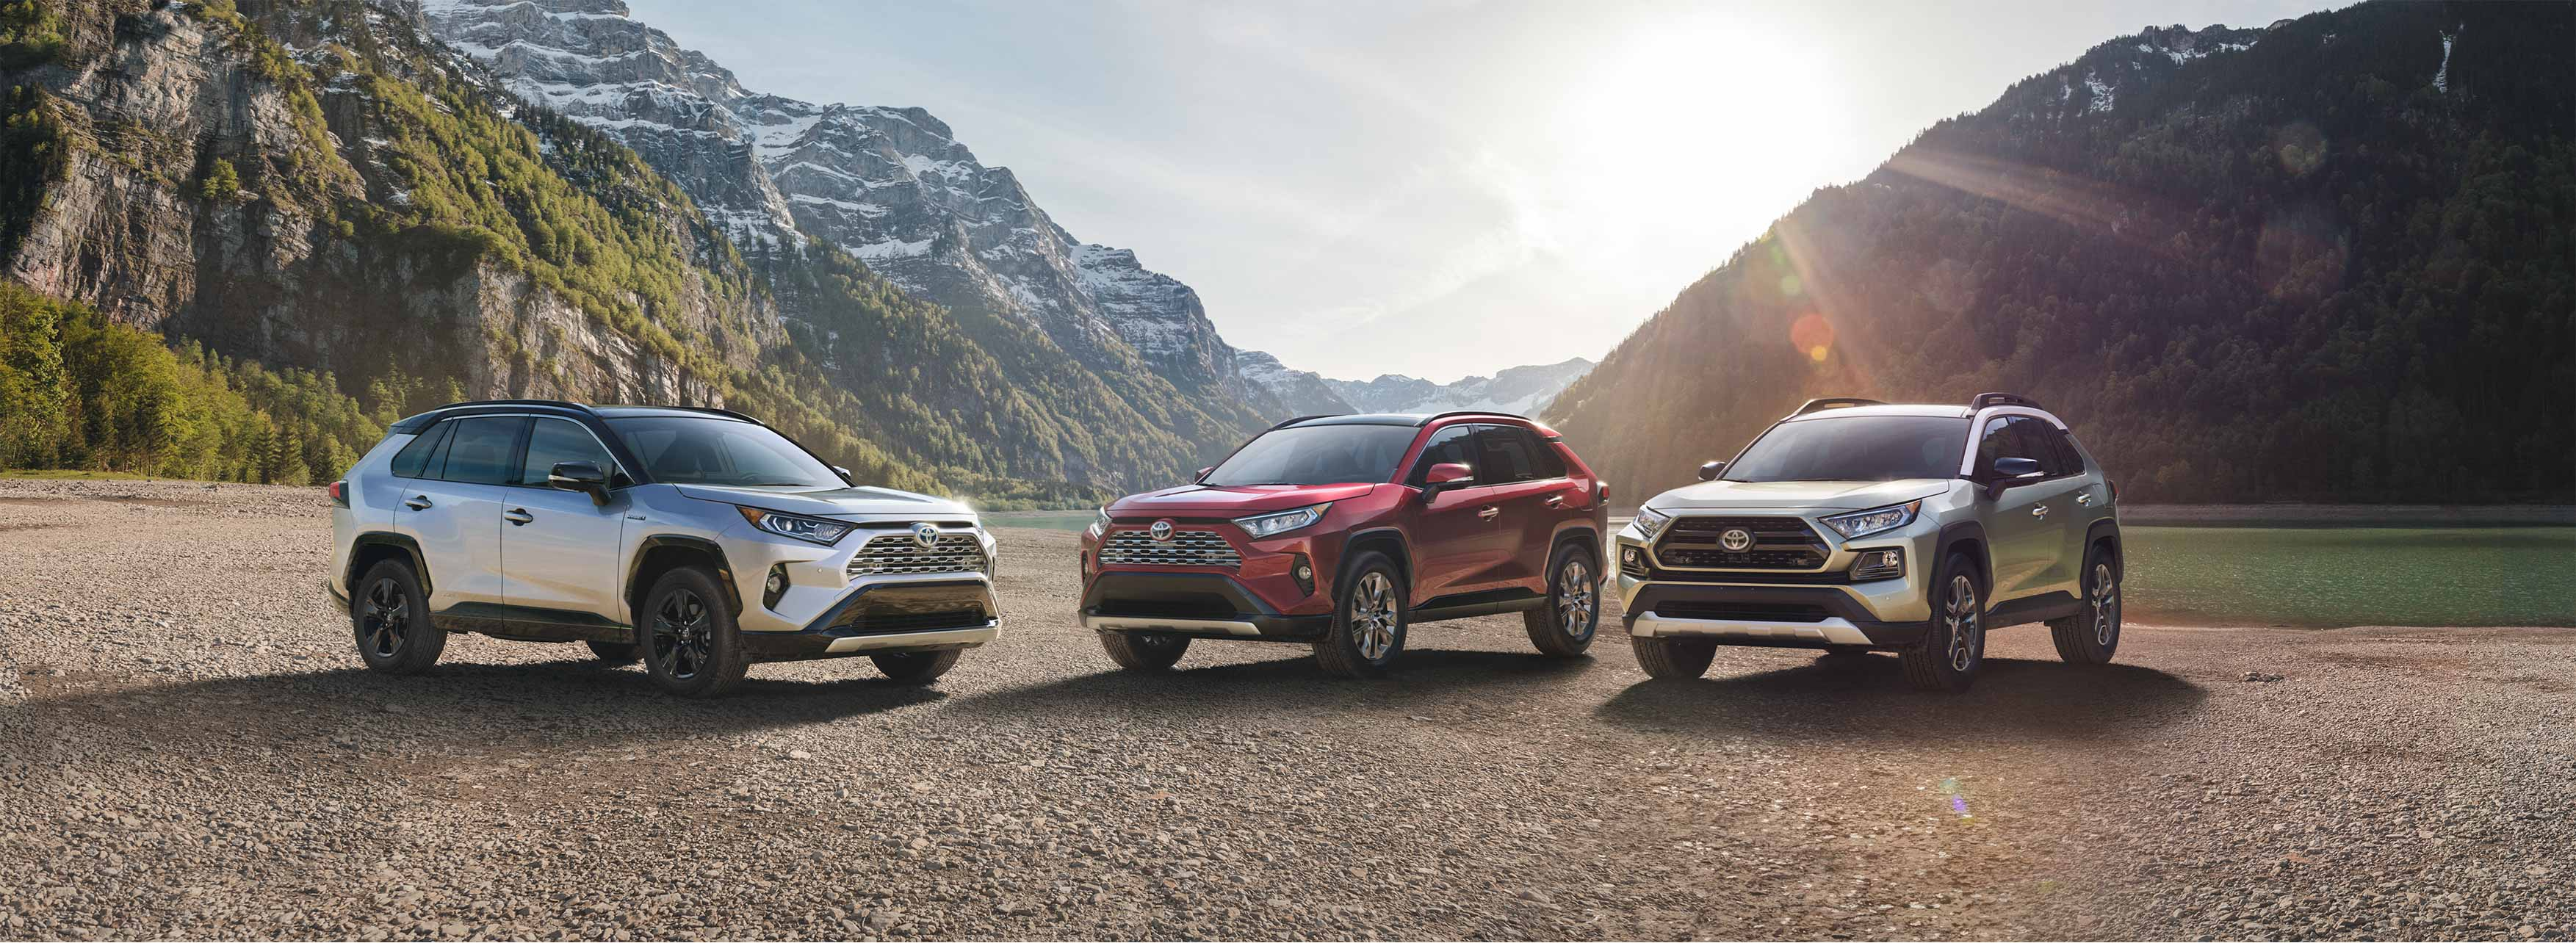 2019 Toyota RAV4 lineup